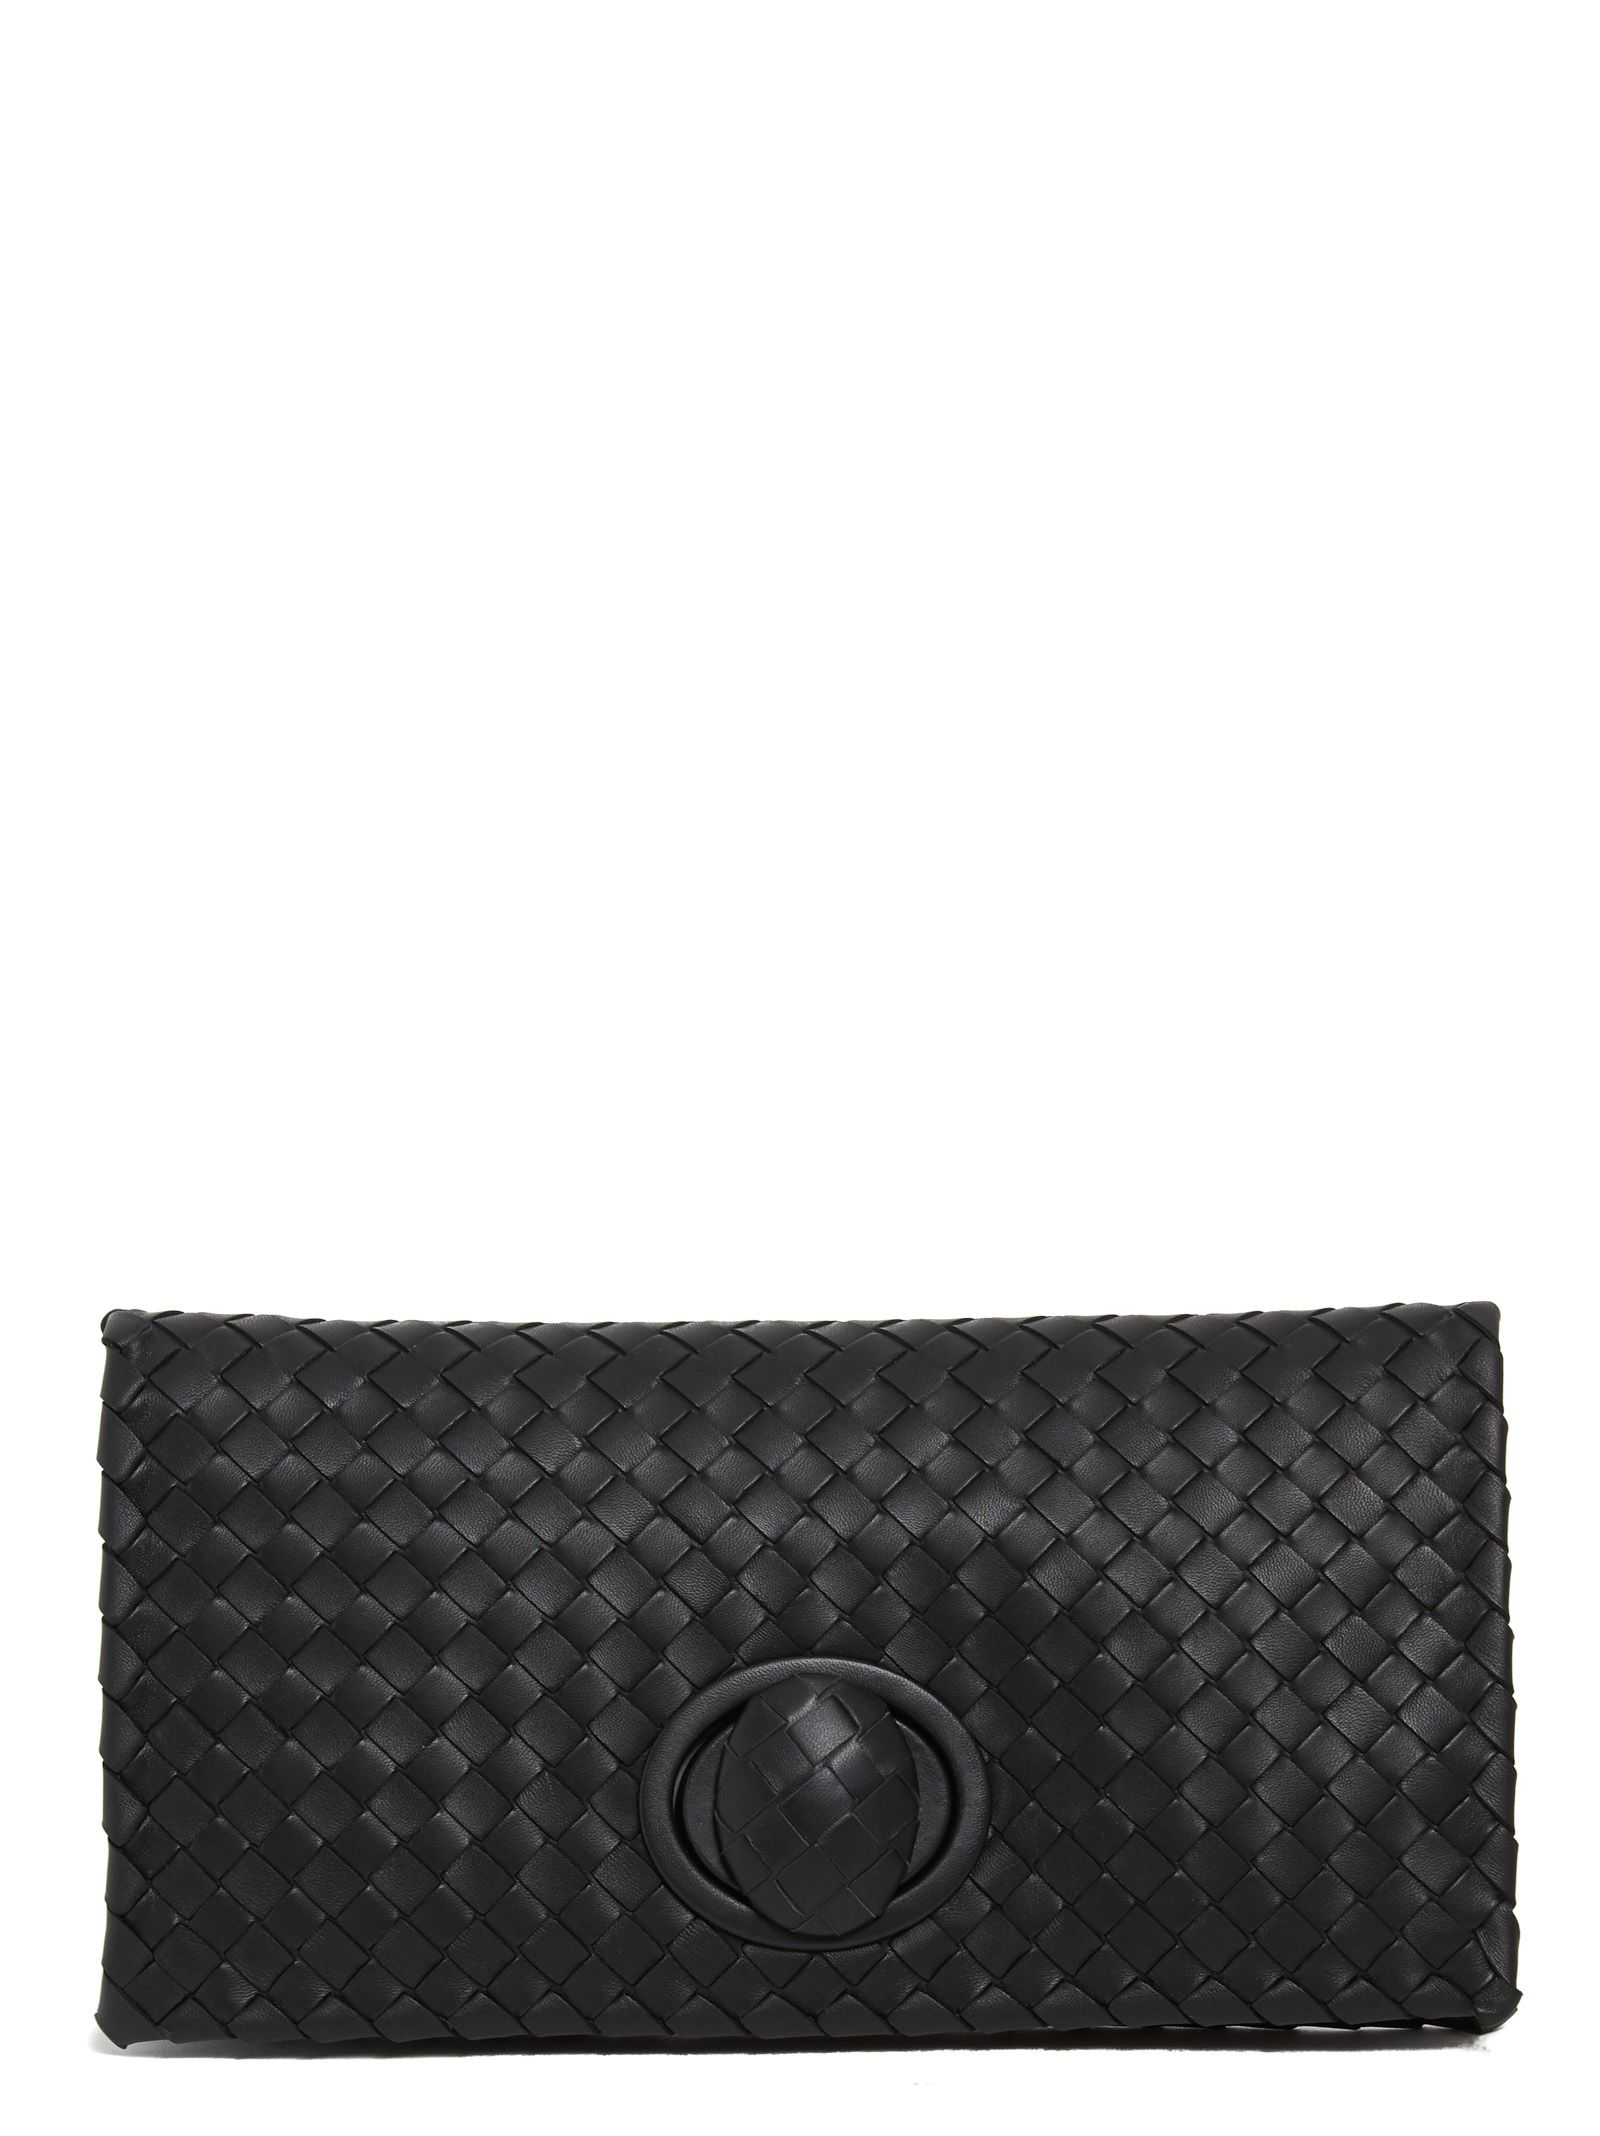 bottega veneta bottega veneta clutch black women 39 s clutches italist. Black Bedroom Furniture Sets. Home Design Ideas